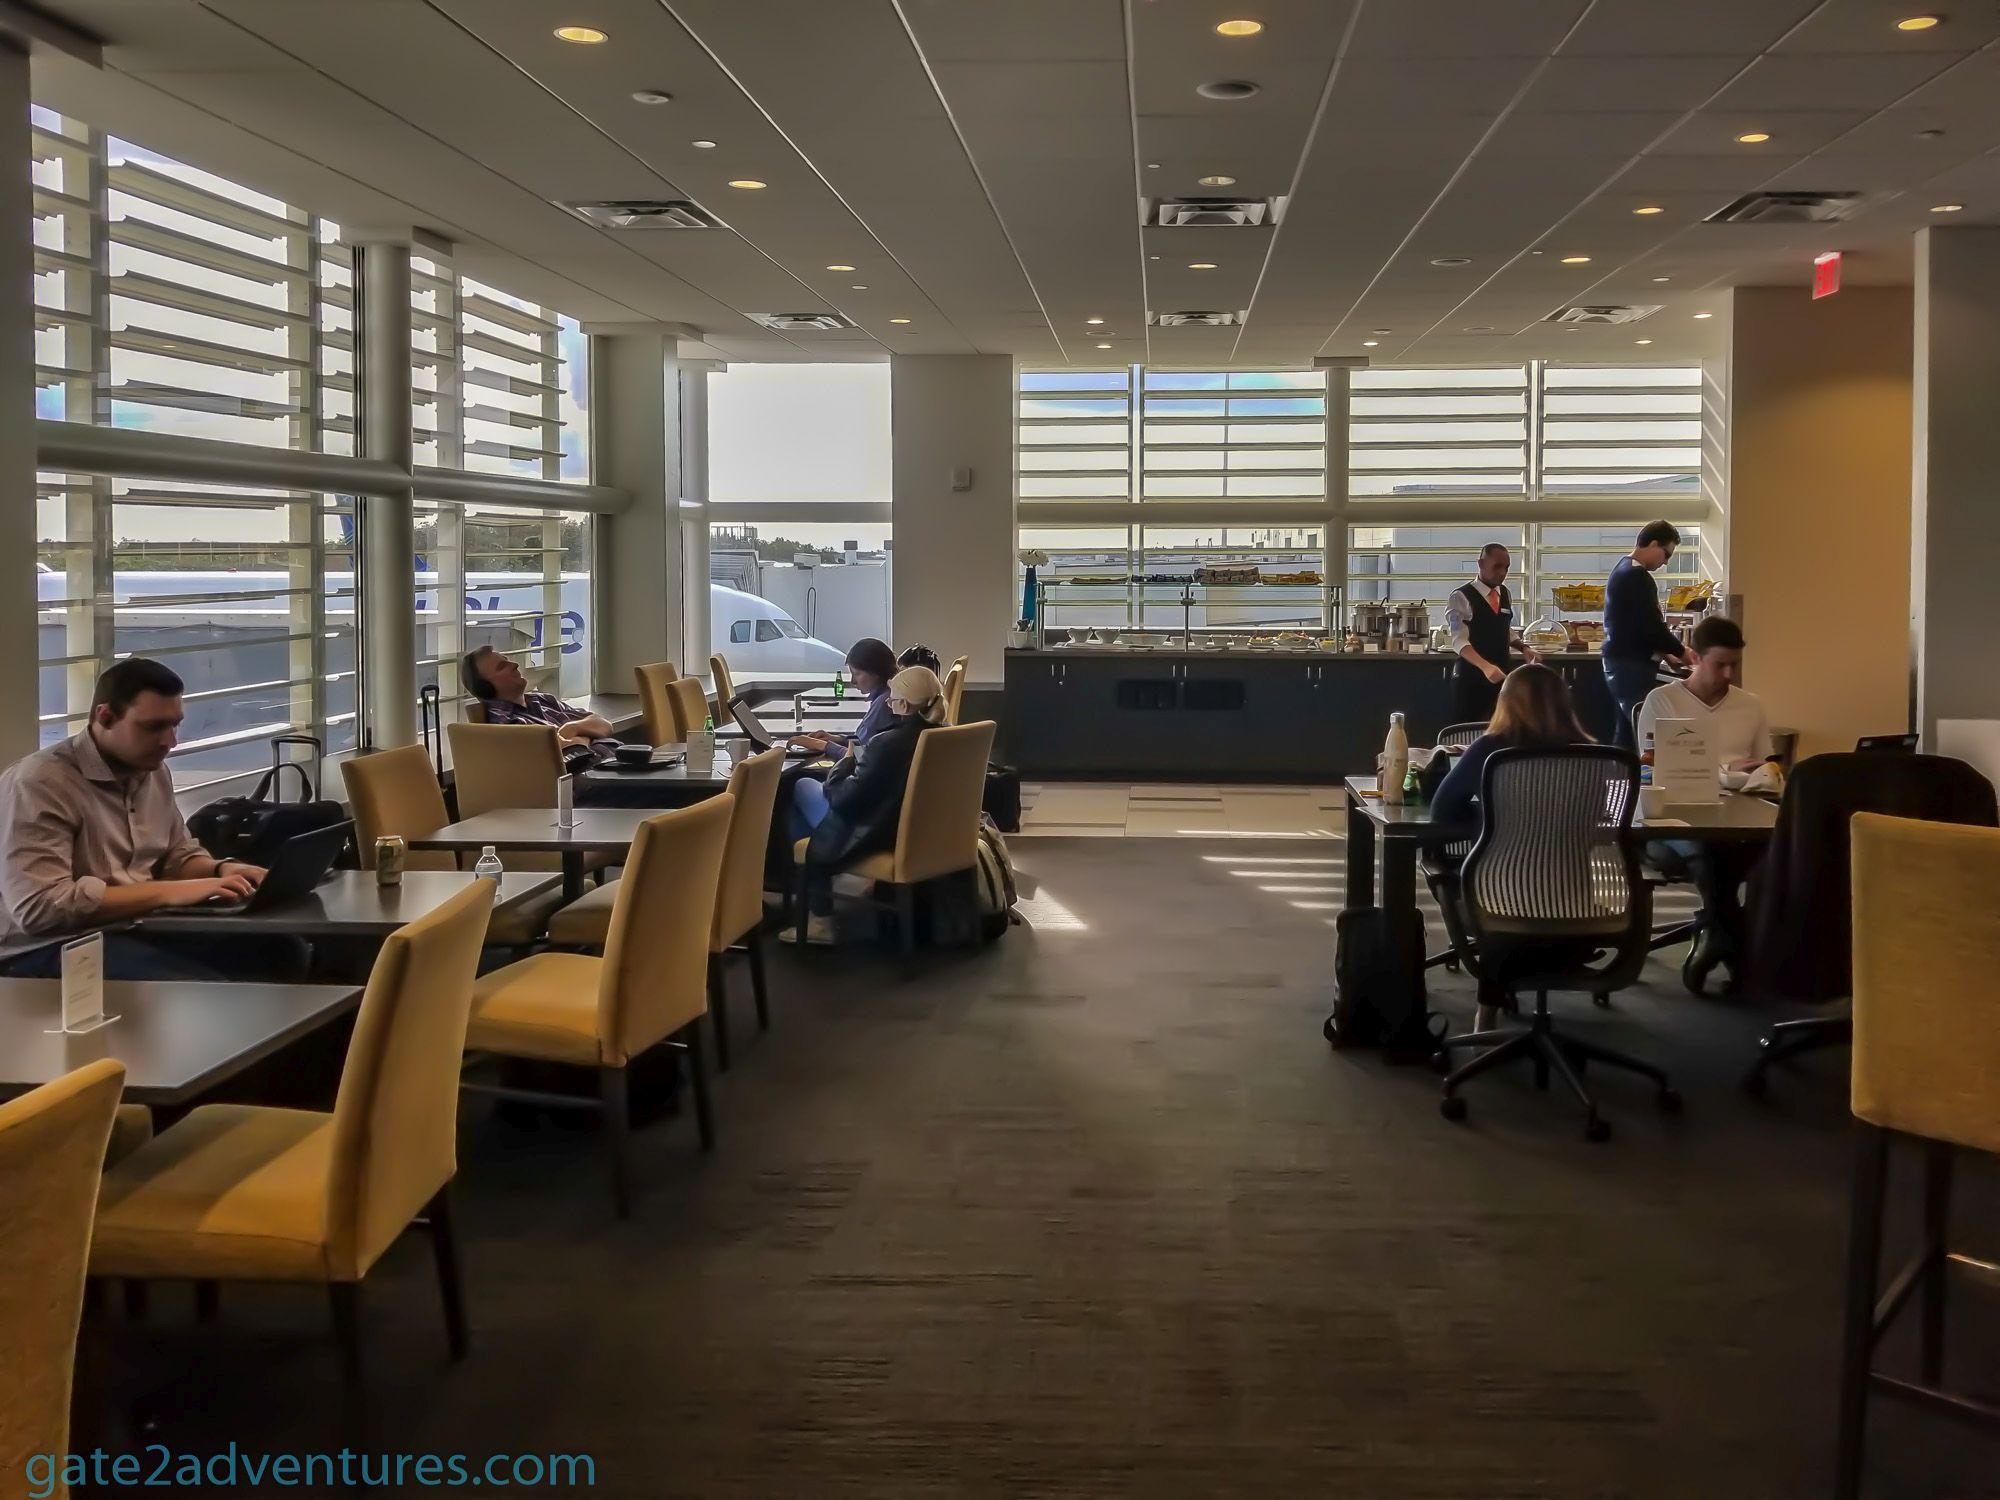 Lounge Review: The Club Orlando International Airport (MCO) Terminal B